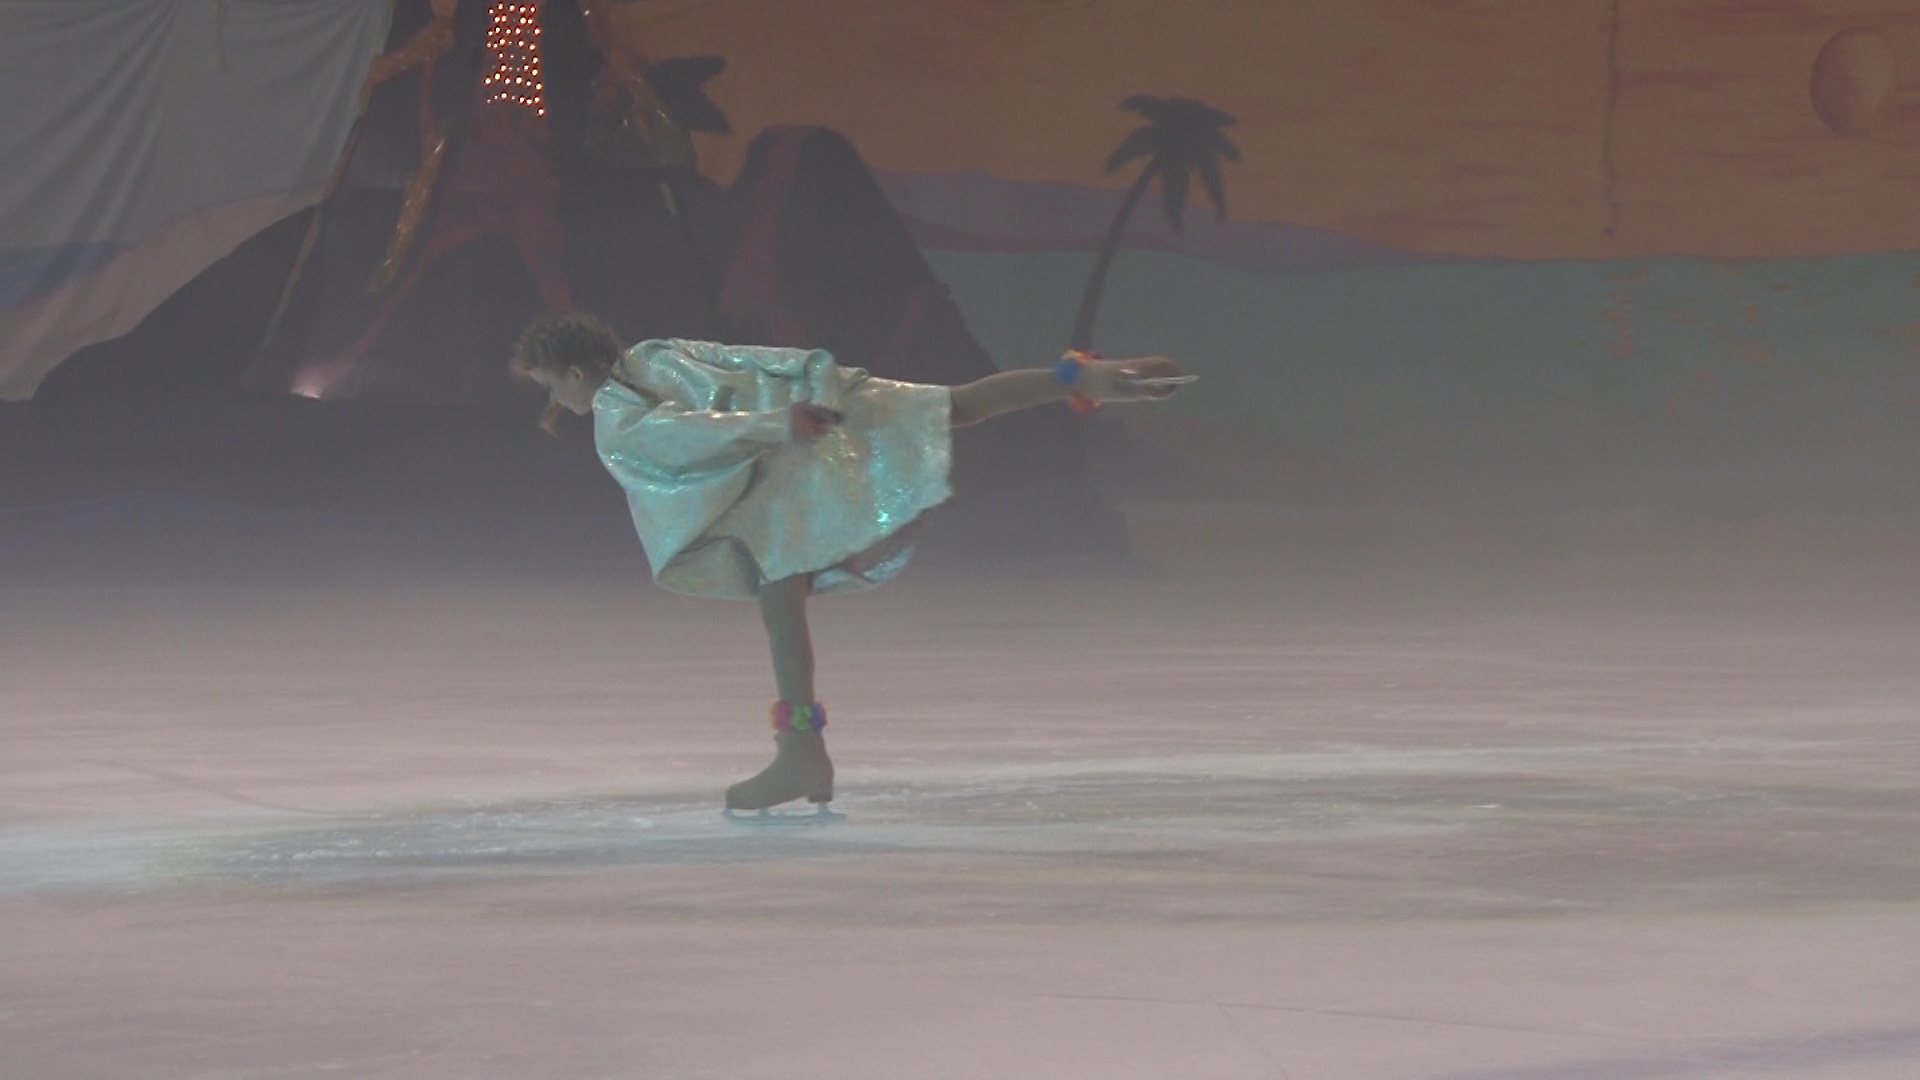 Power Play Maui Skate on Ice 071417.00_46_06_20.Still070.jpg